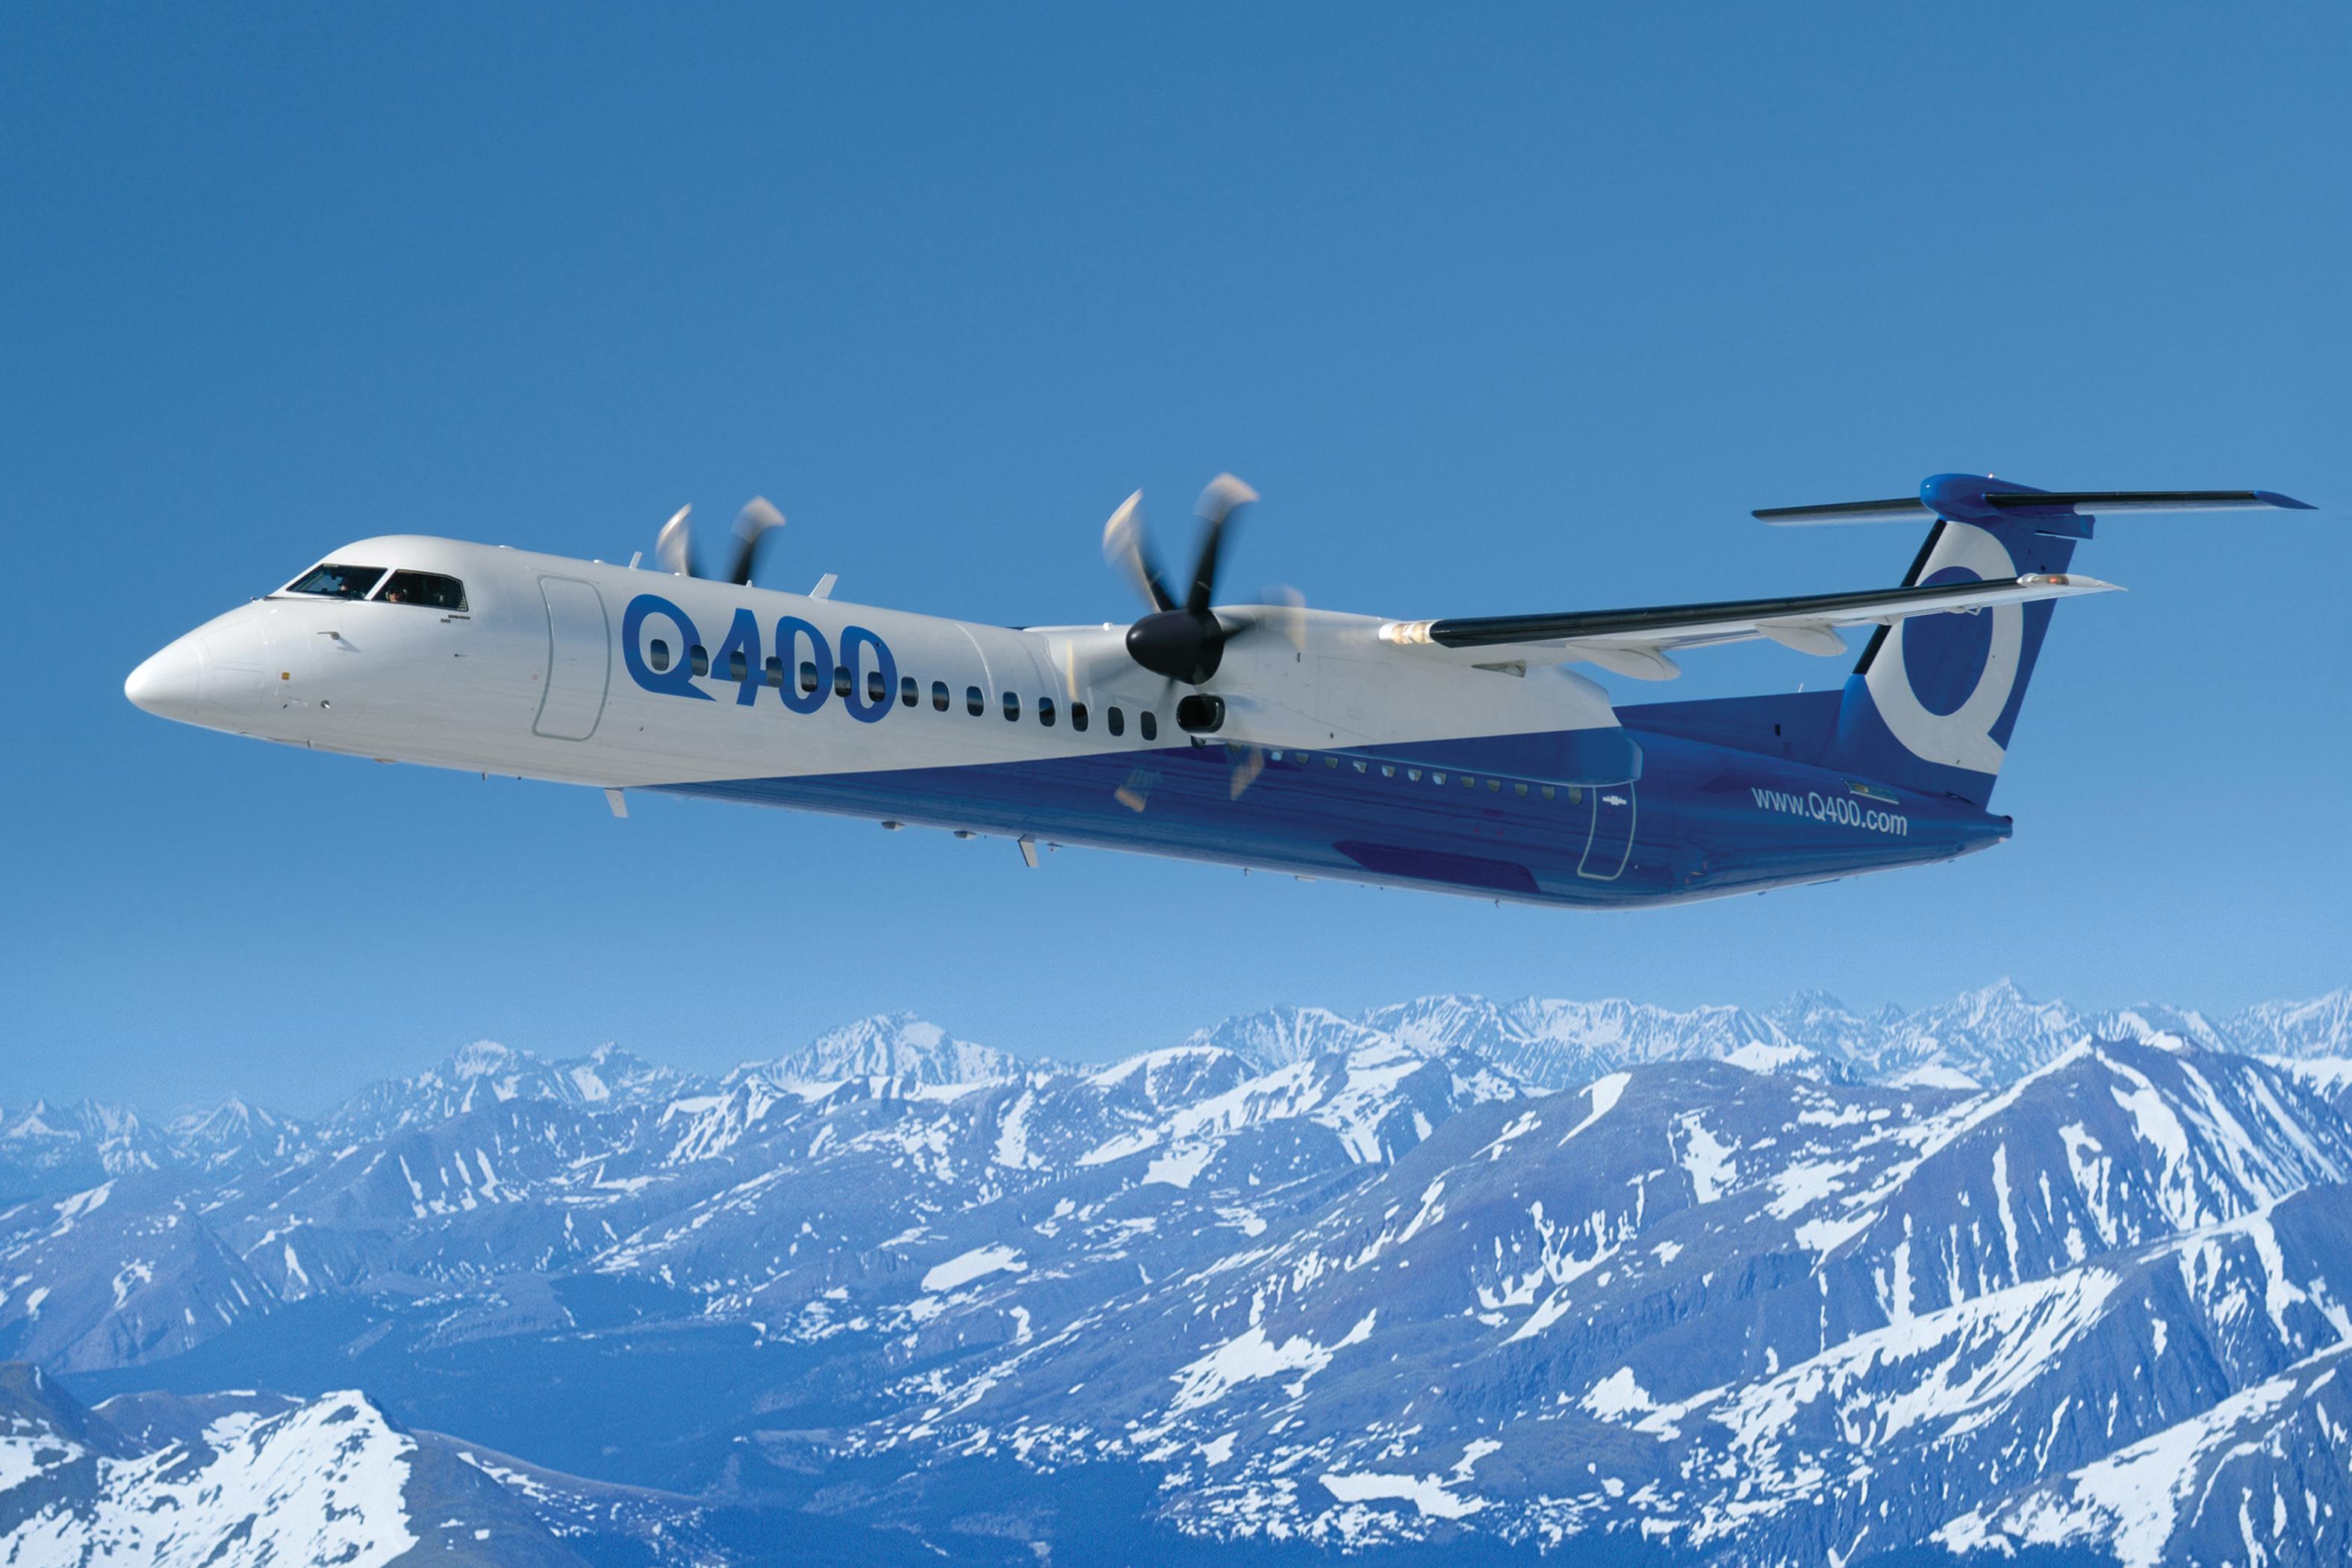 Bombardier продала программу производства турбовинтовых самолетов компании Viking Air